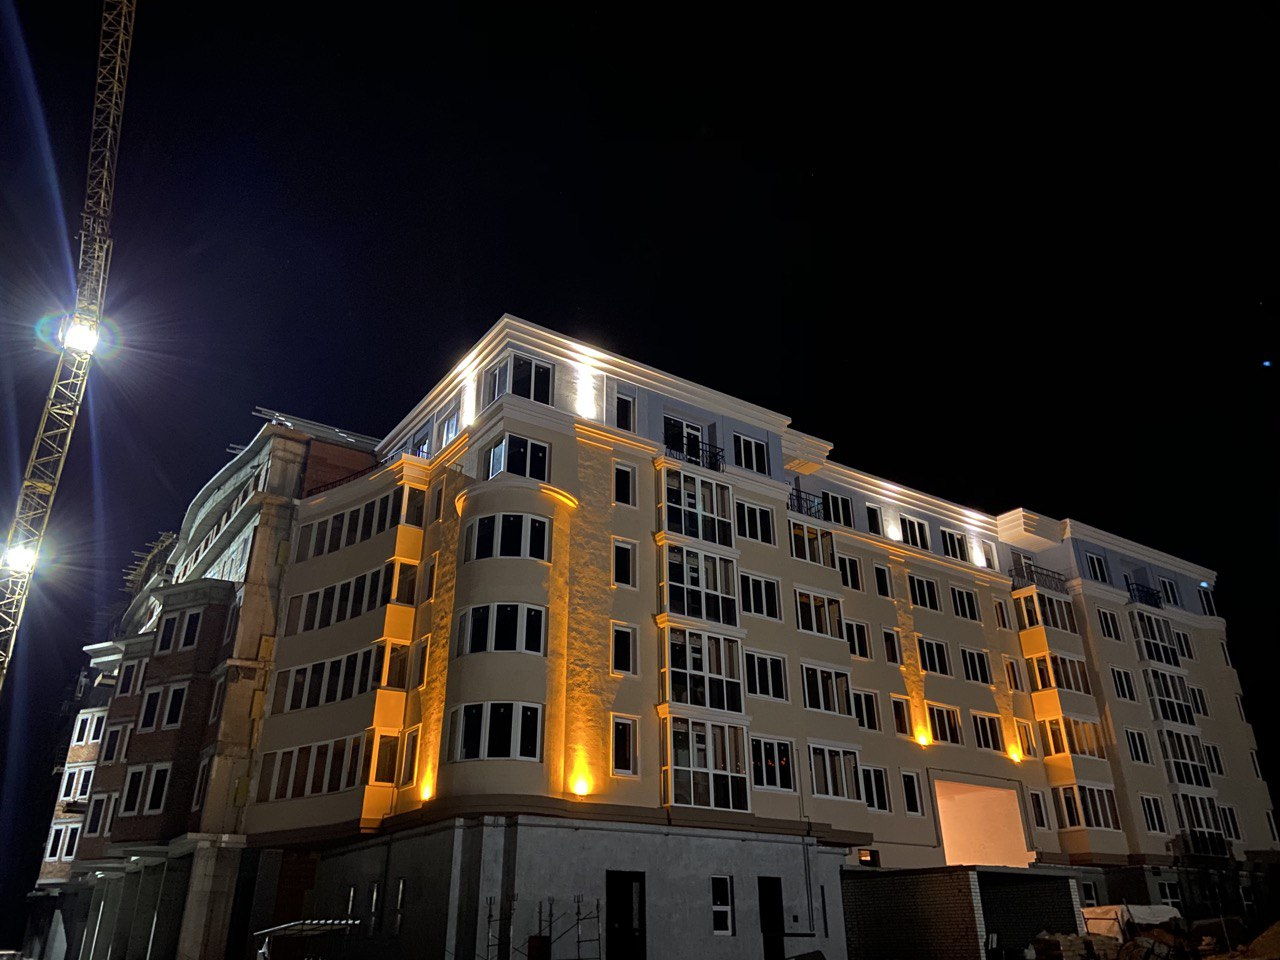 «Нижнему Новгороду нужен мастер-план по подсветке» - Роман Улитин - фото 3